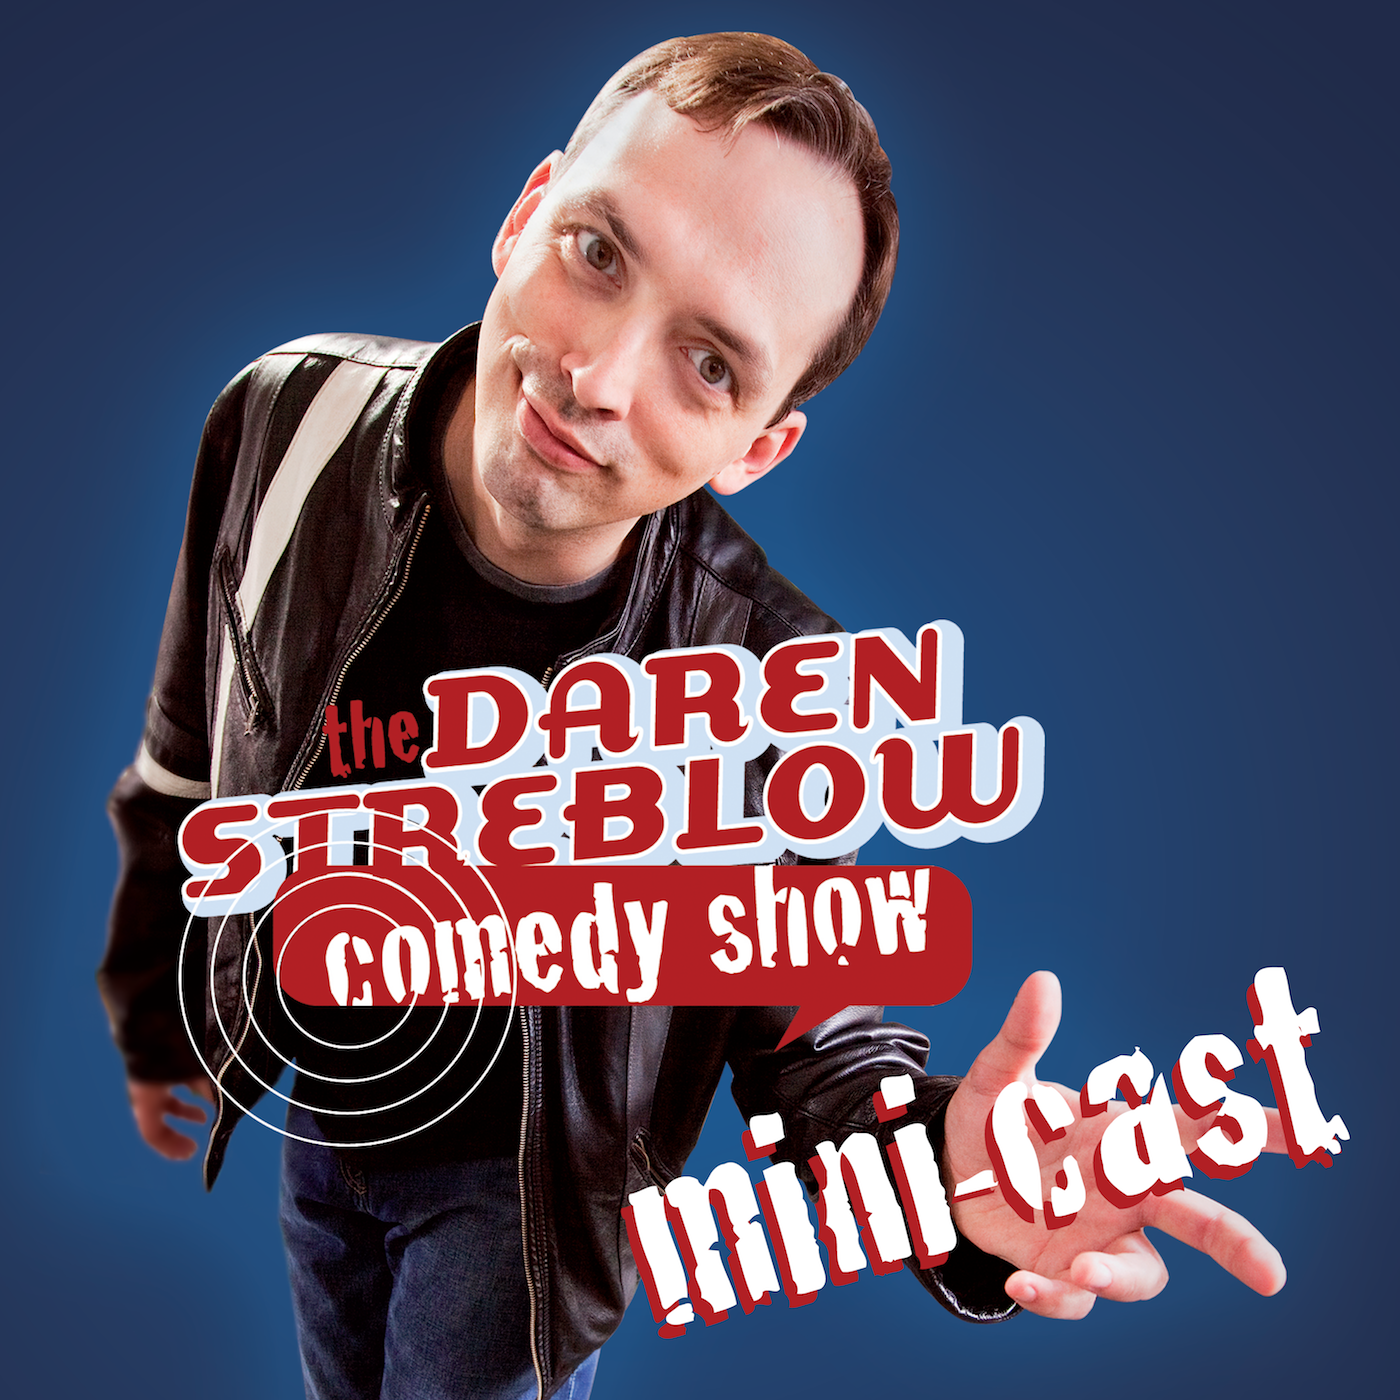 The Daren Streblow Comedy Show Mini-Cast 158: Tim Hawkins